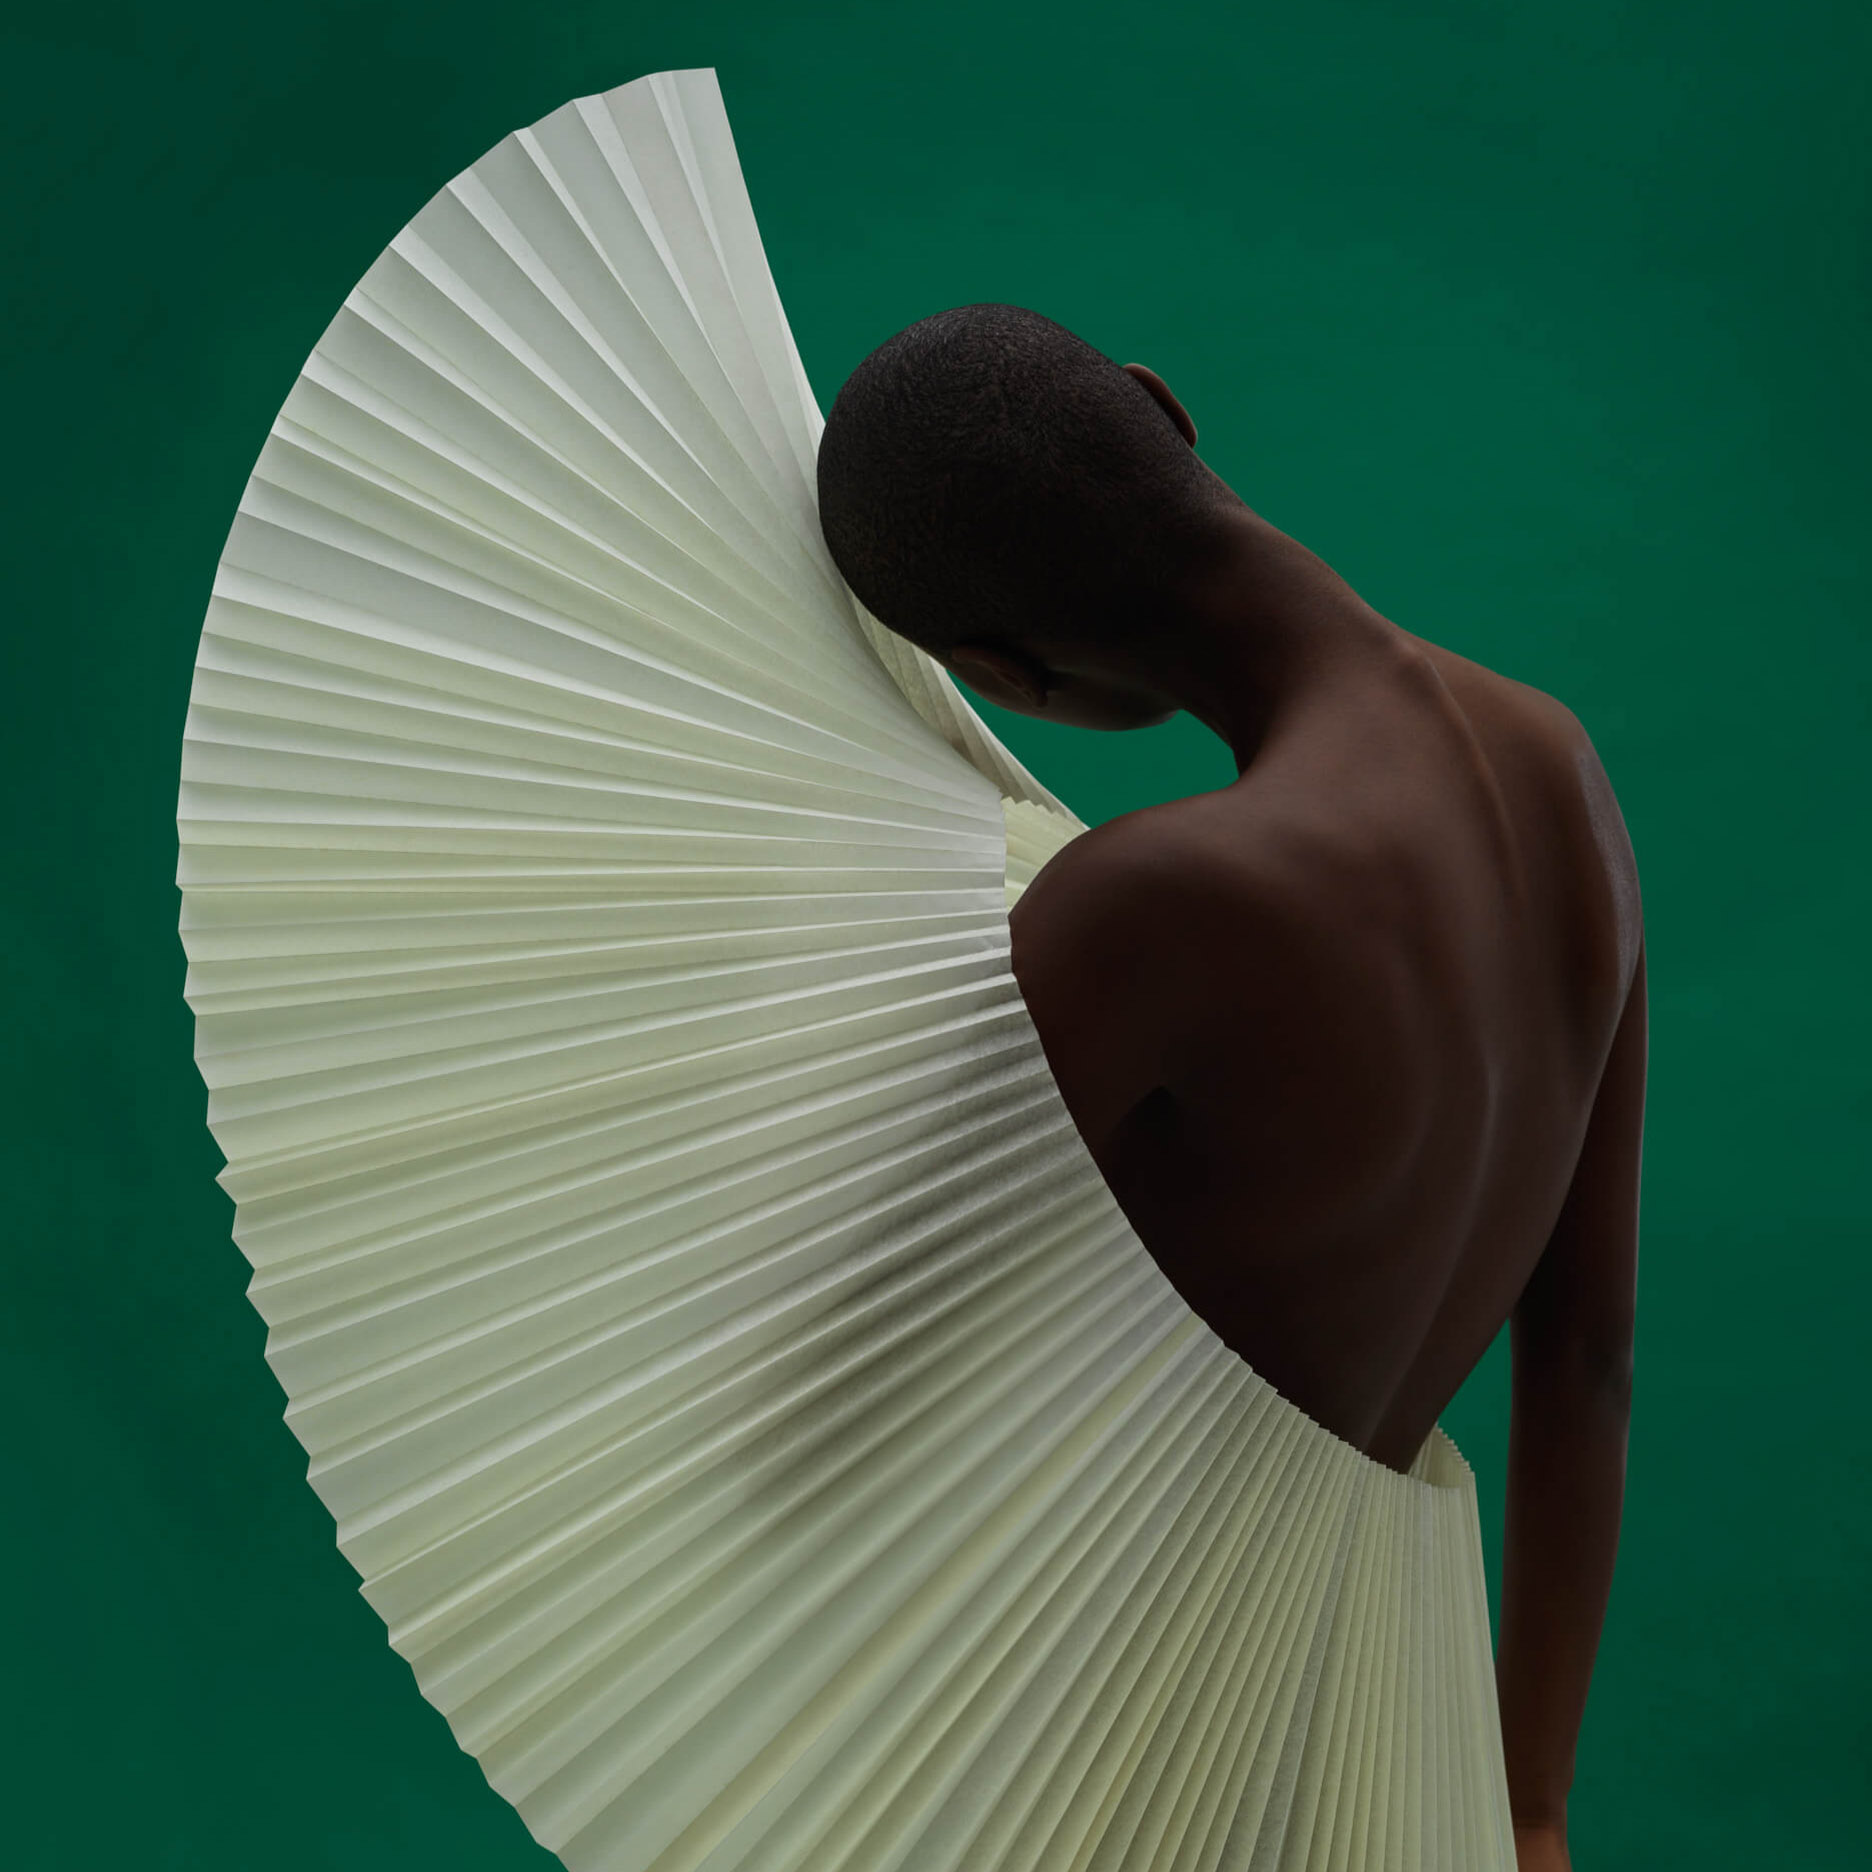 Gavin Goodman | Pleating Paper into Sculptural Headwear